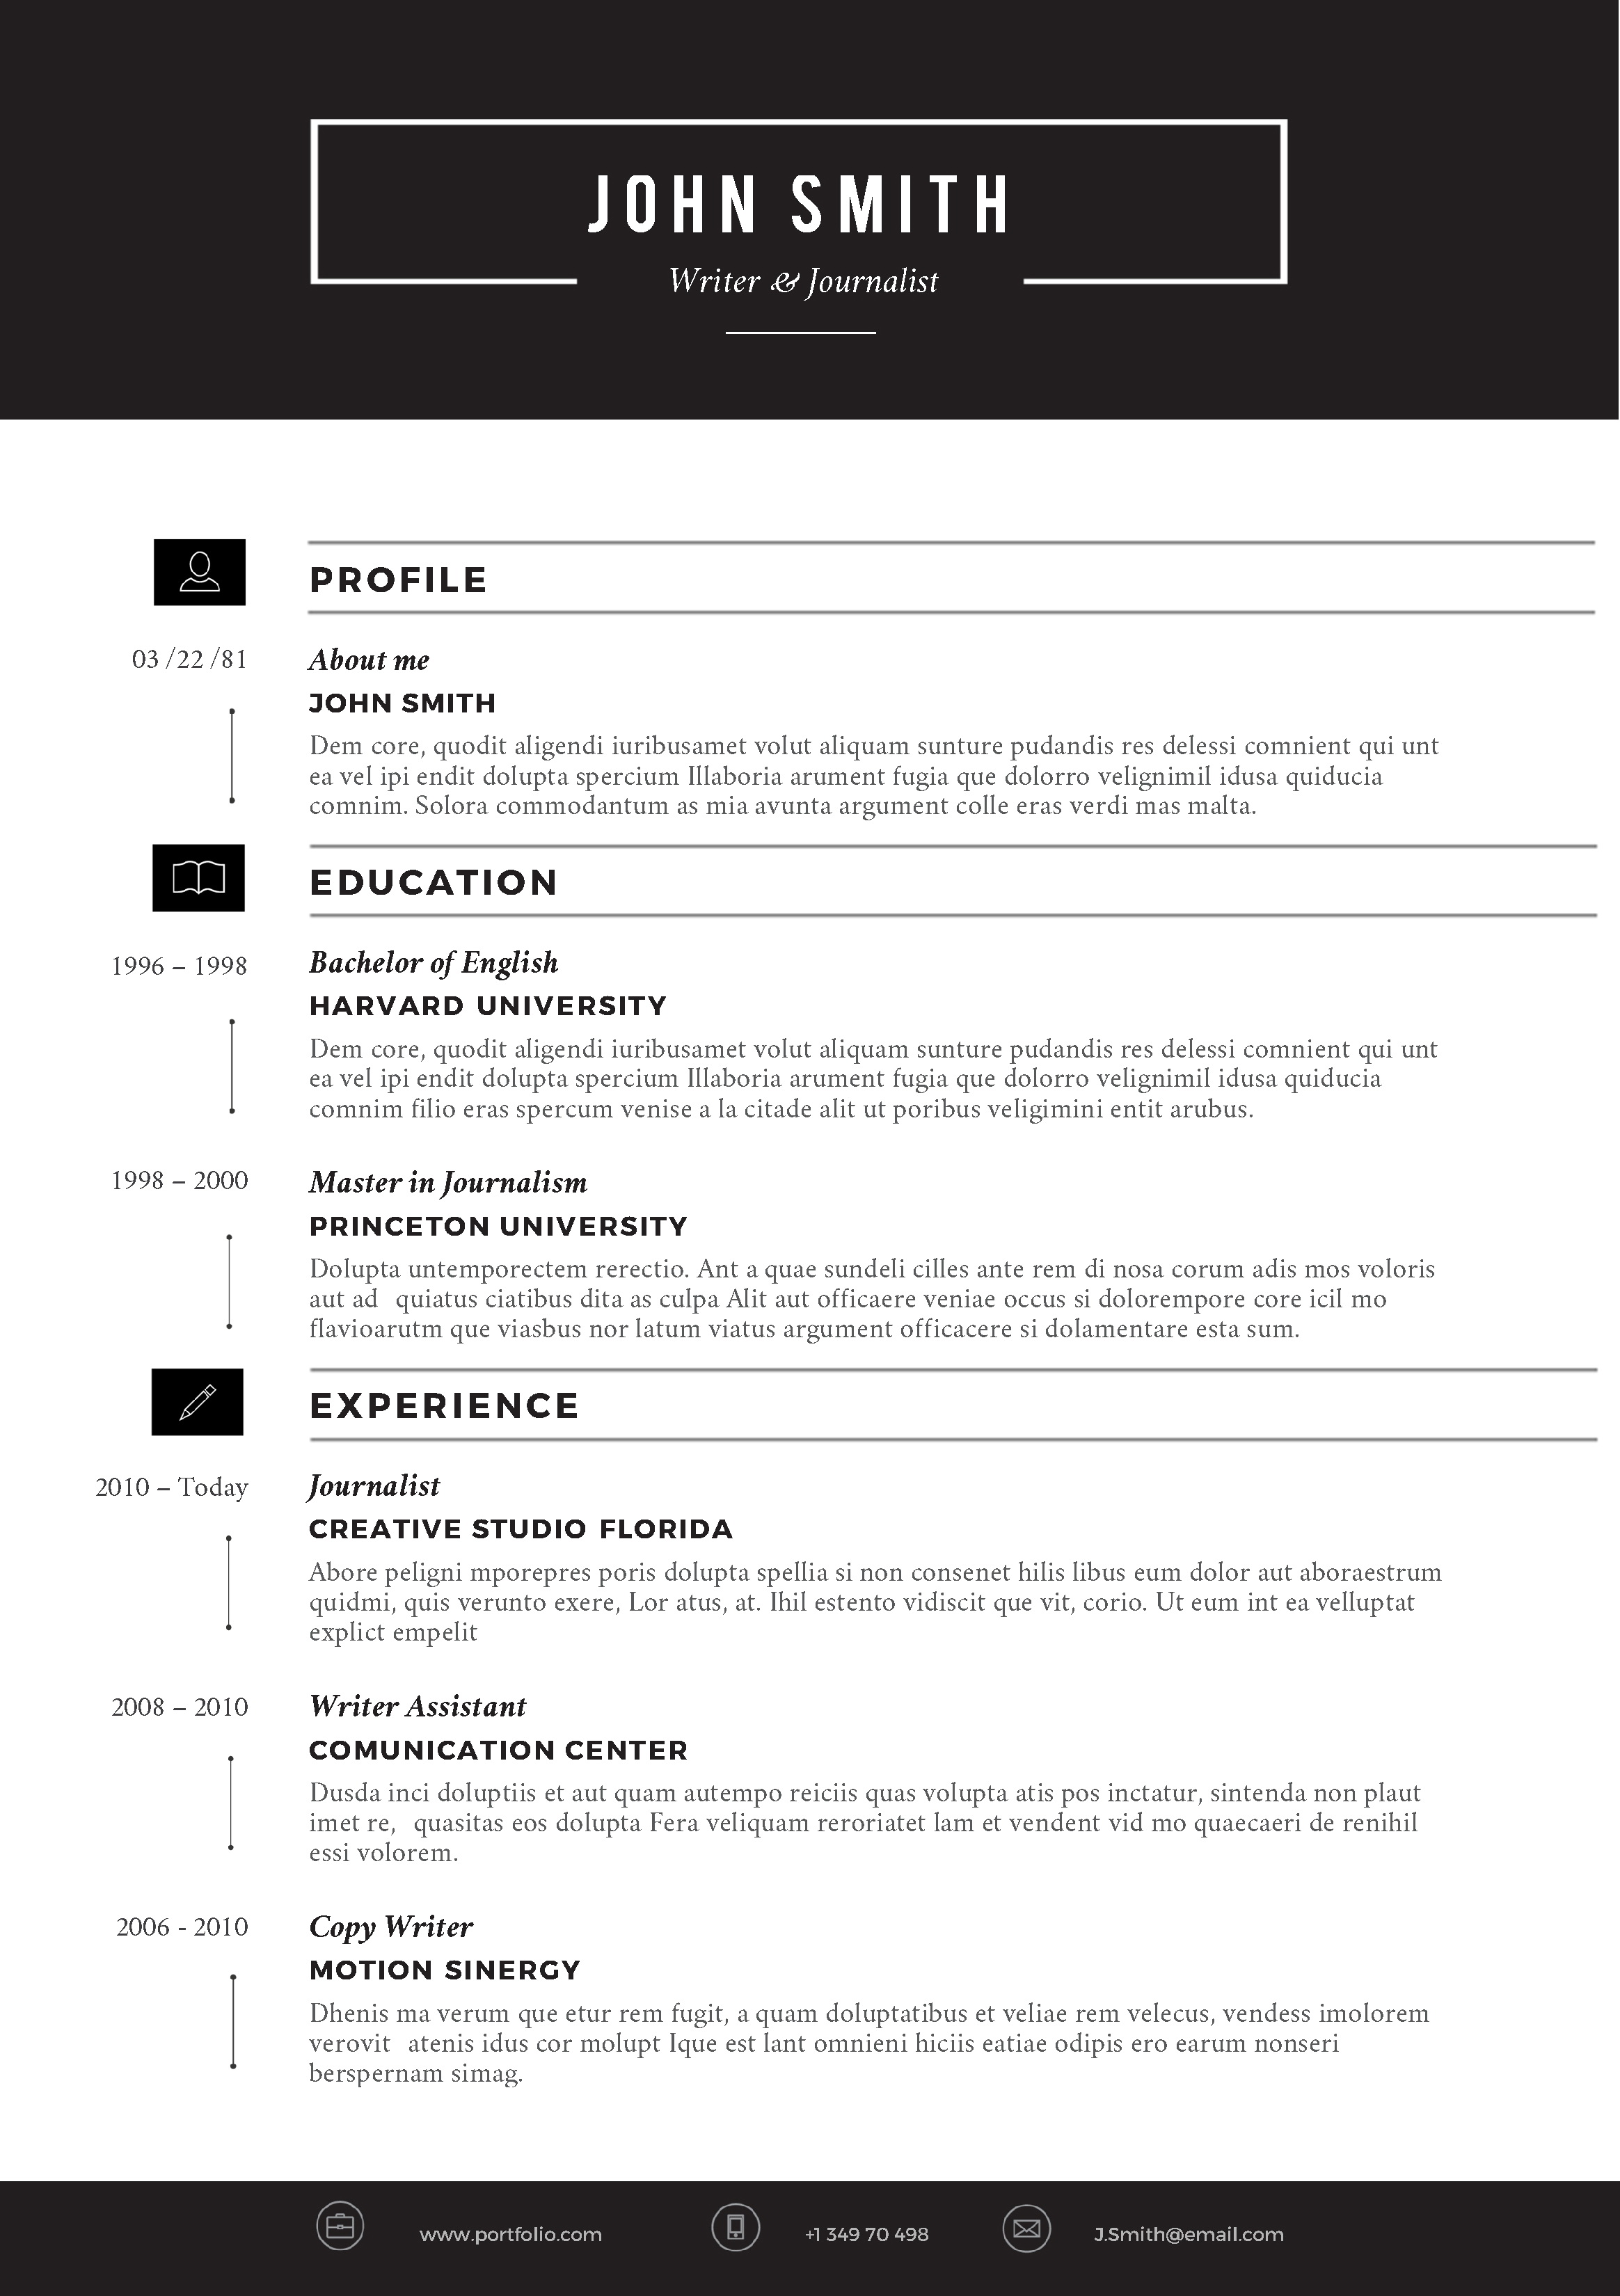 Resume Layout On Microsoft Word